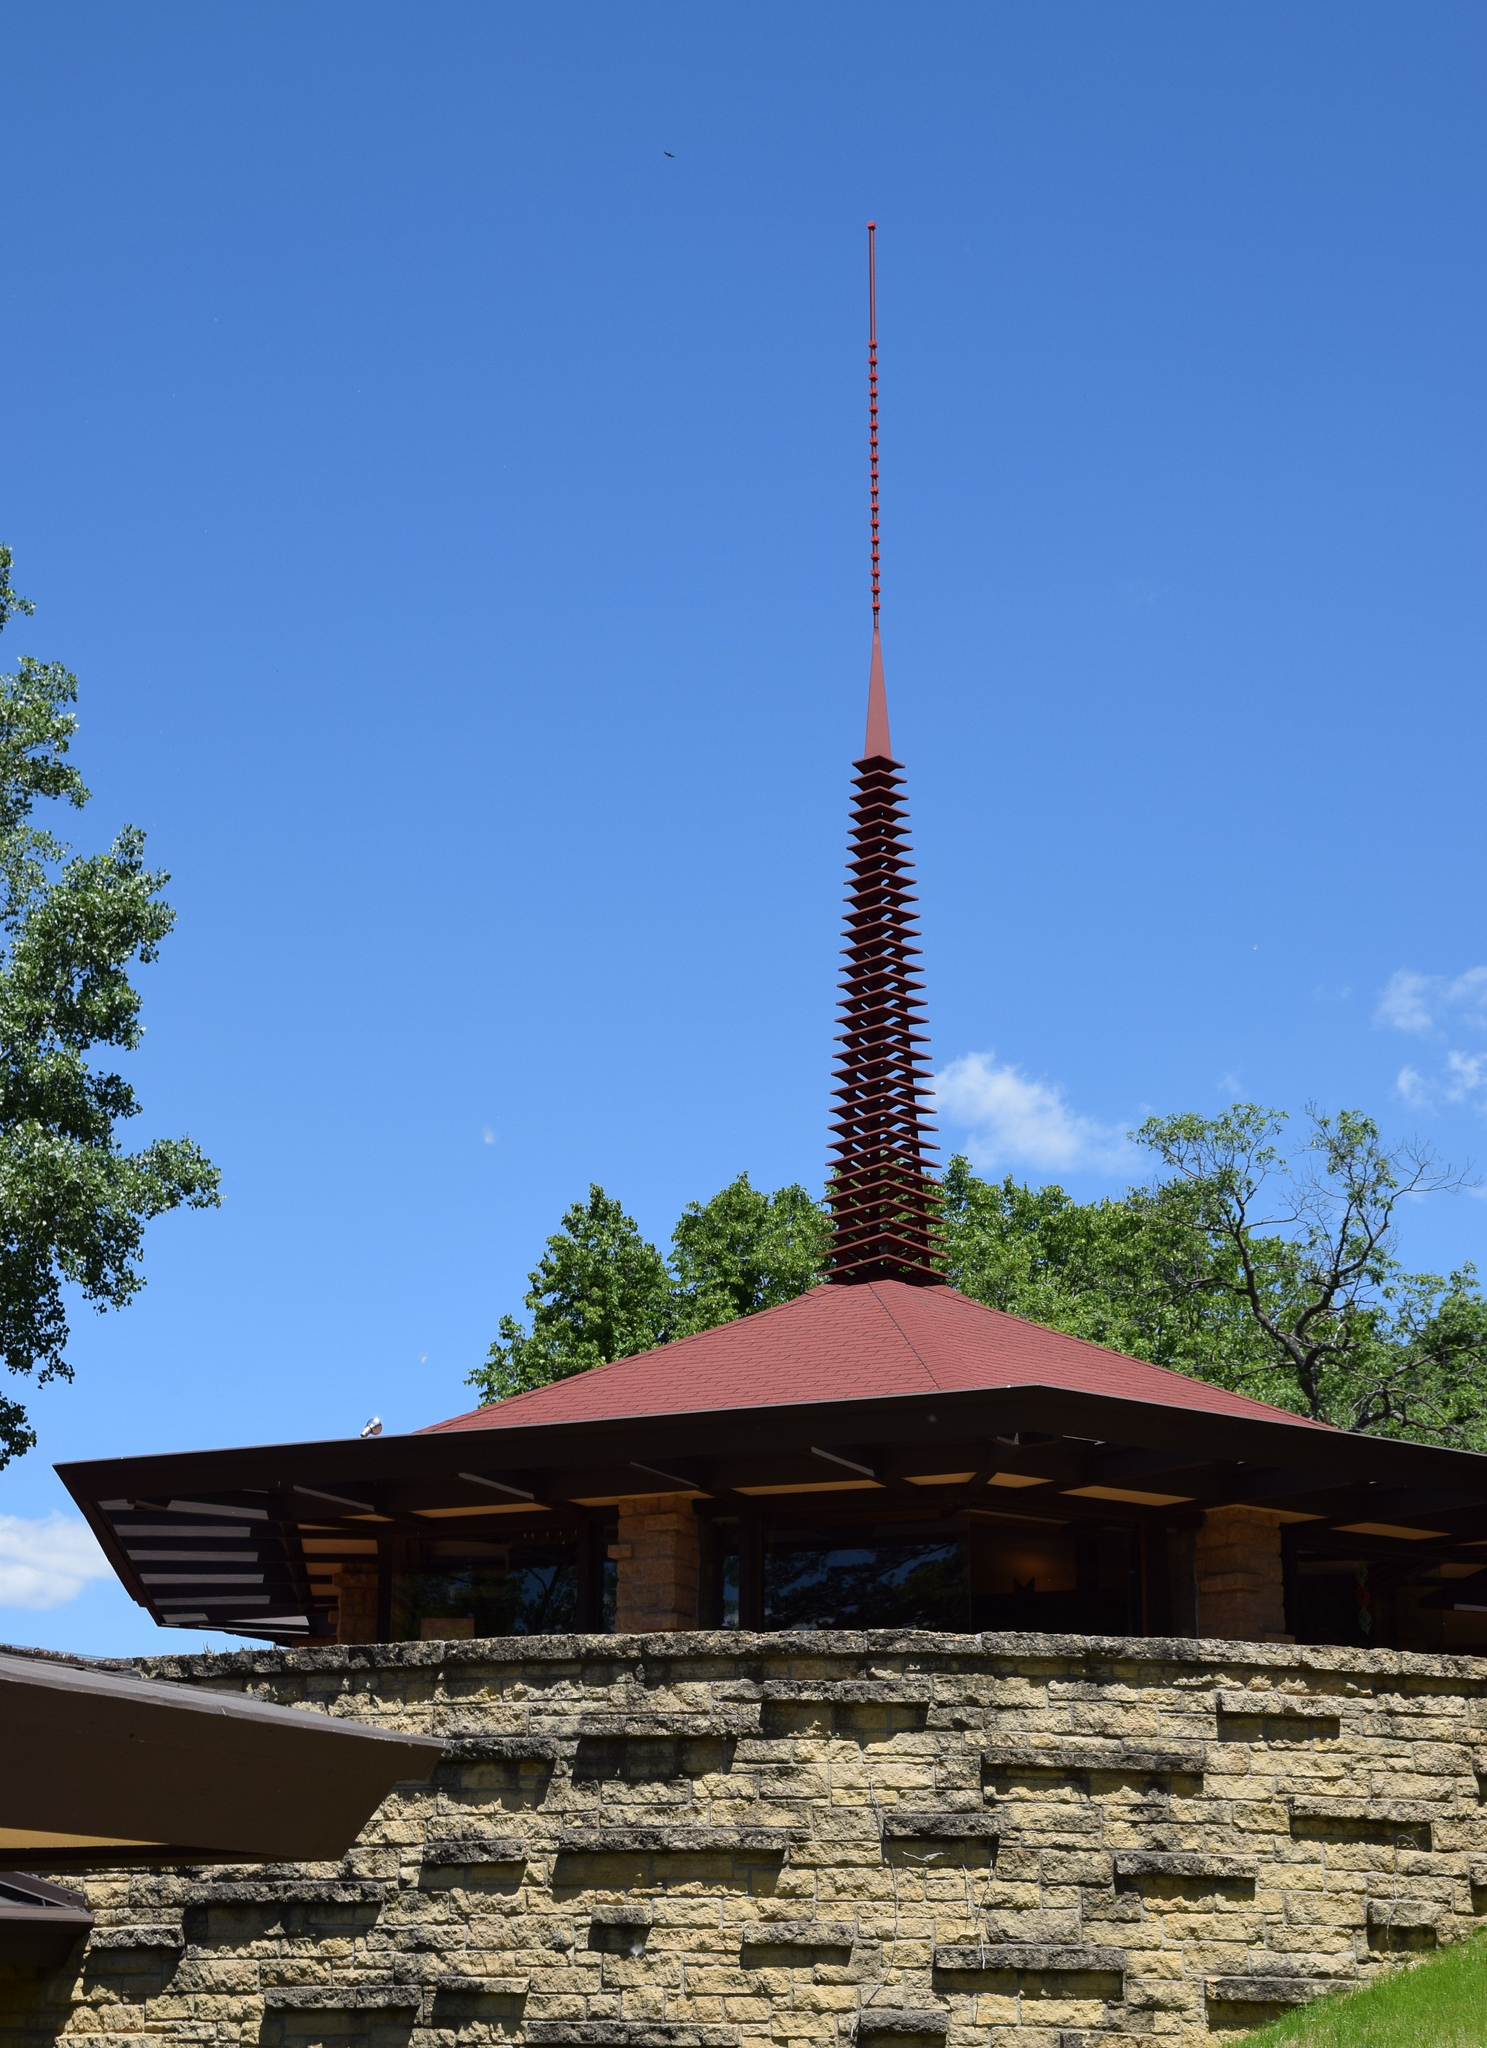 Taliesin Visitors Center